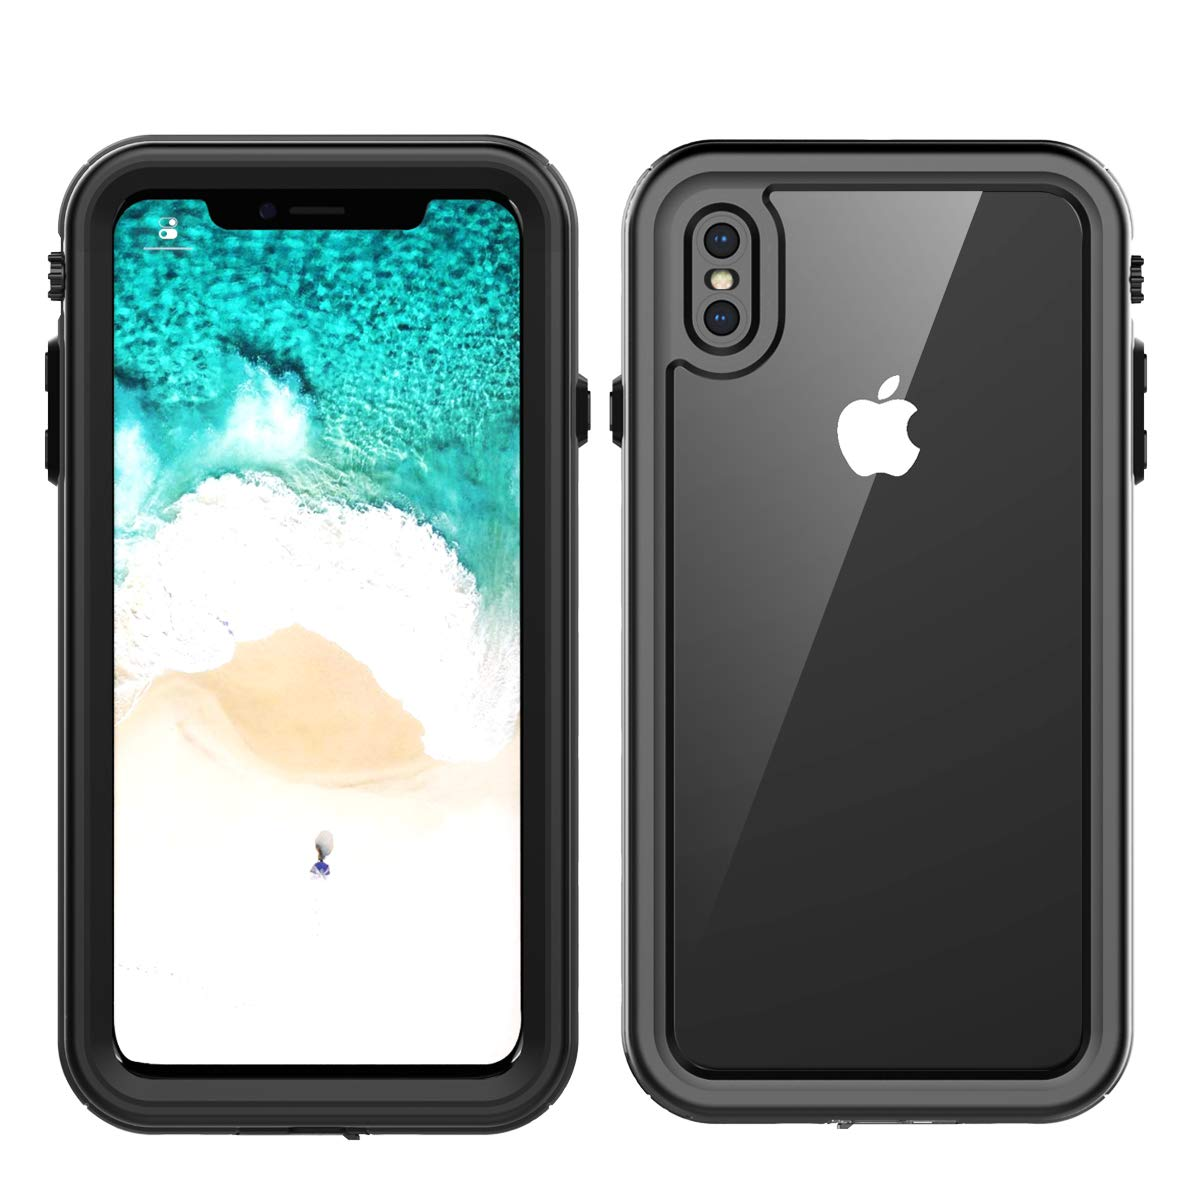 AICEDA 水中ハウジング iPhone Xs Max、グレード IP68 携帯電話ケース 水泳 水中 写真 ビデオ カメラ防水ケース 交換用 iiPhone Xs Max (ブラック)   B07JQ1HT5G